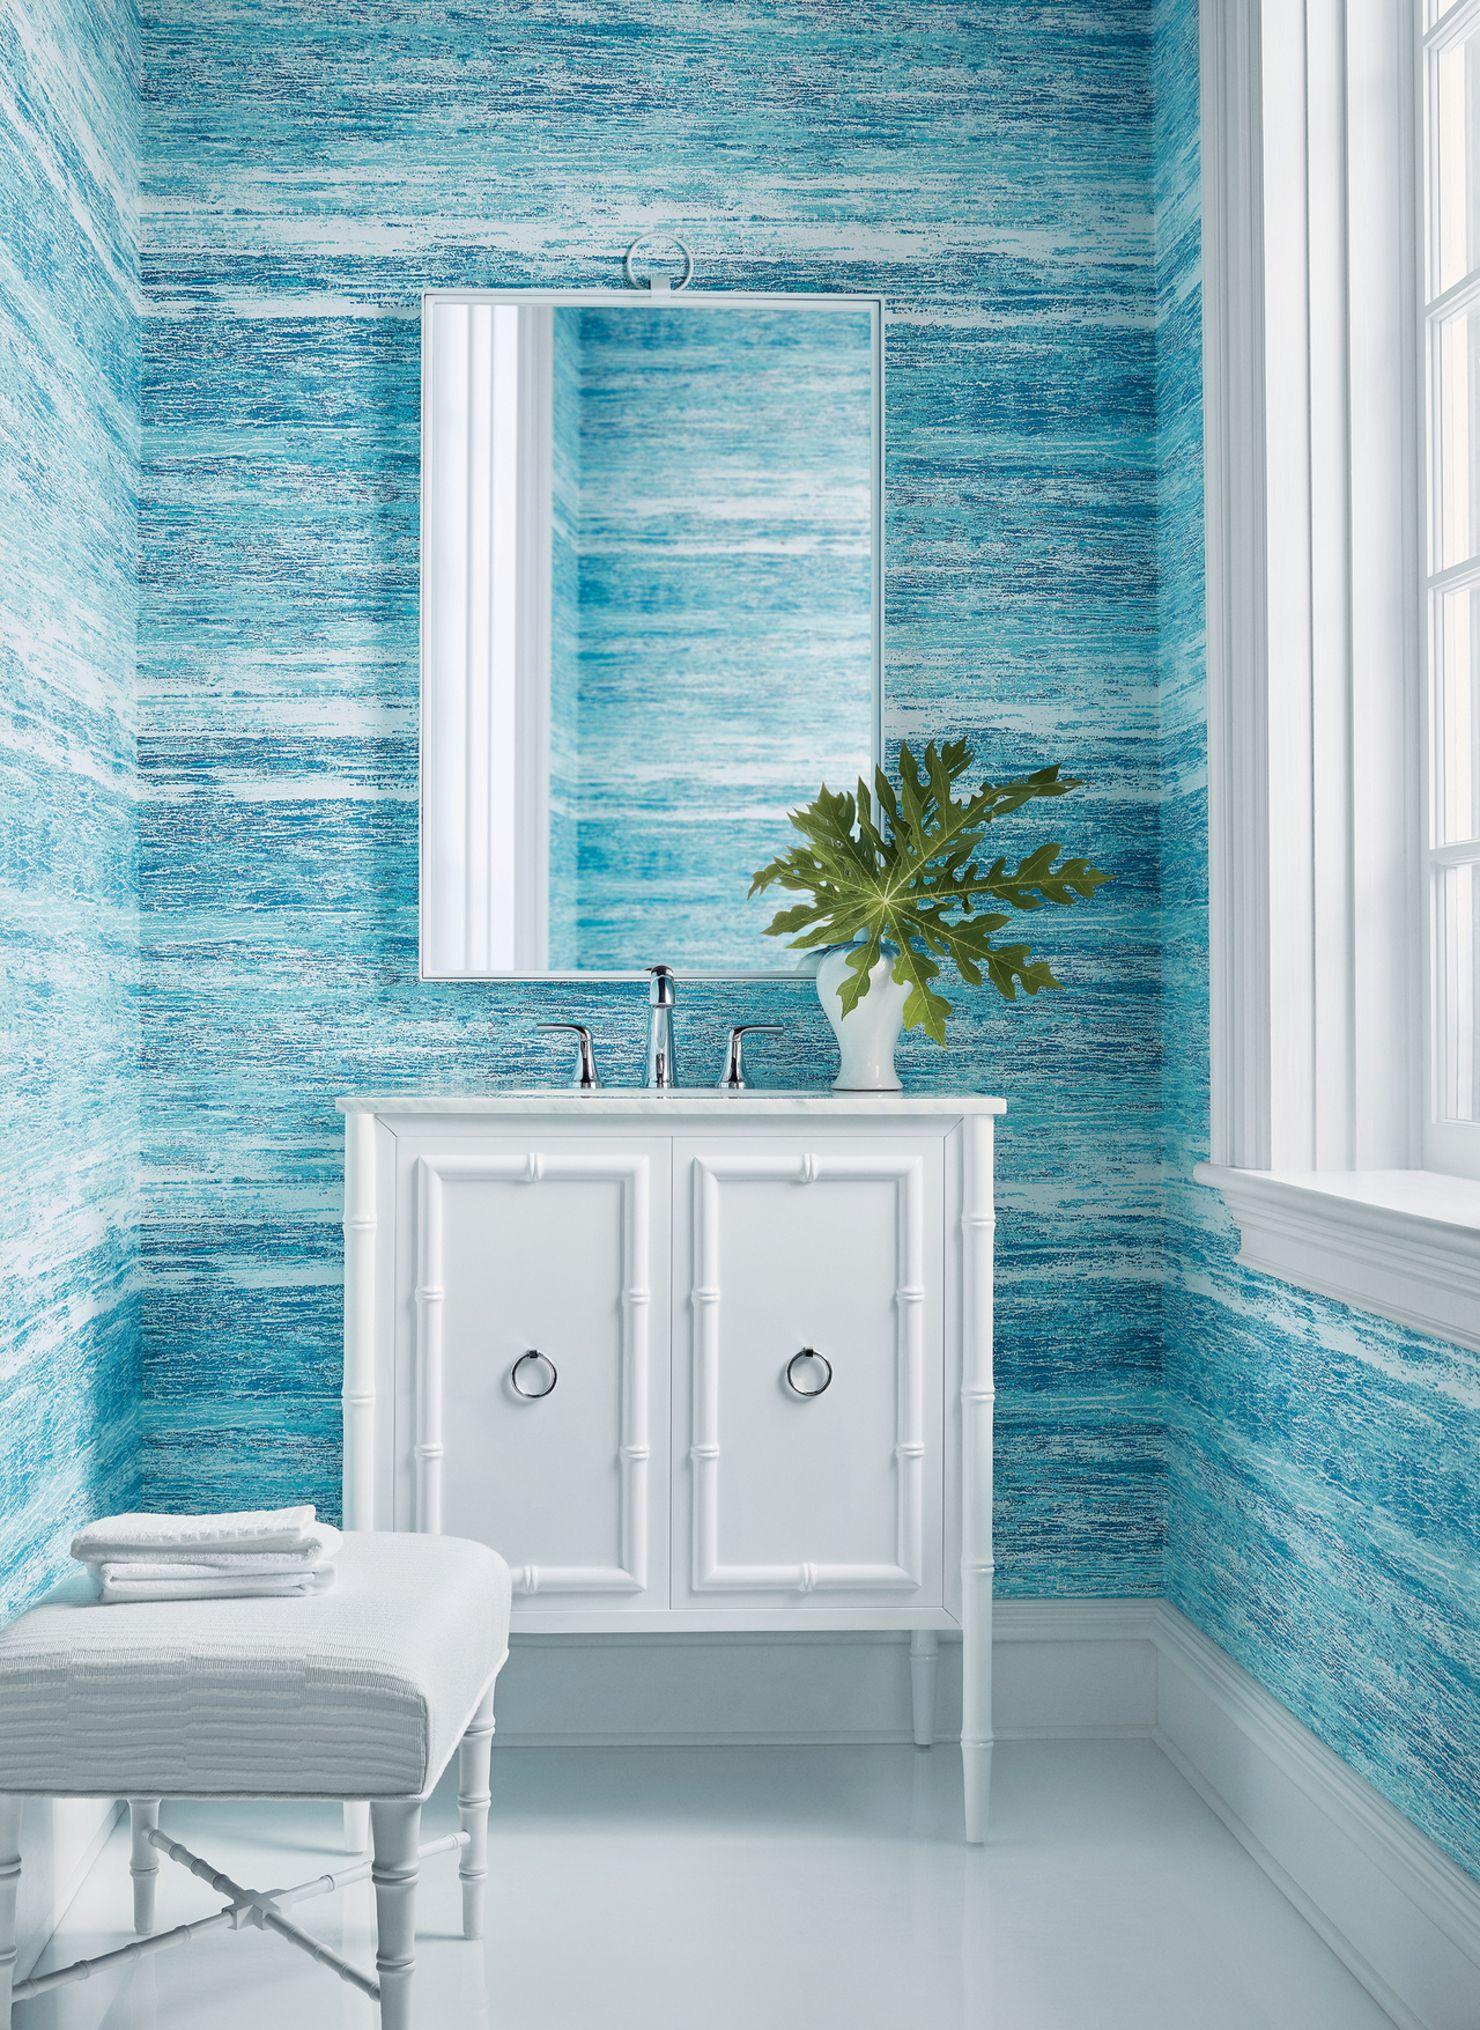 Thibaut Wallpapers in 2020 | Bathroom wallpaper trends ...